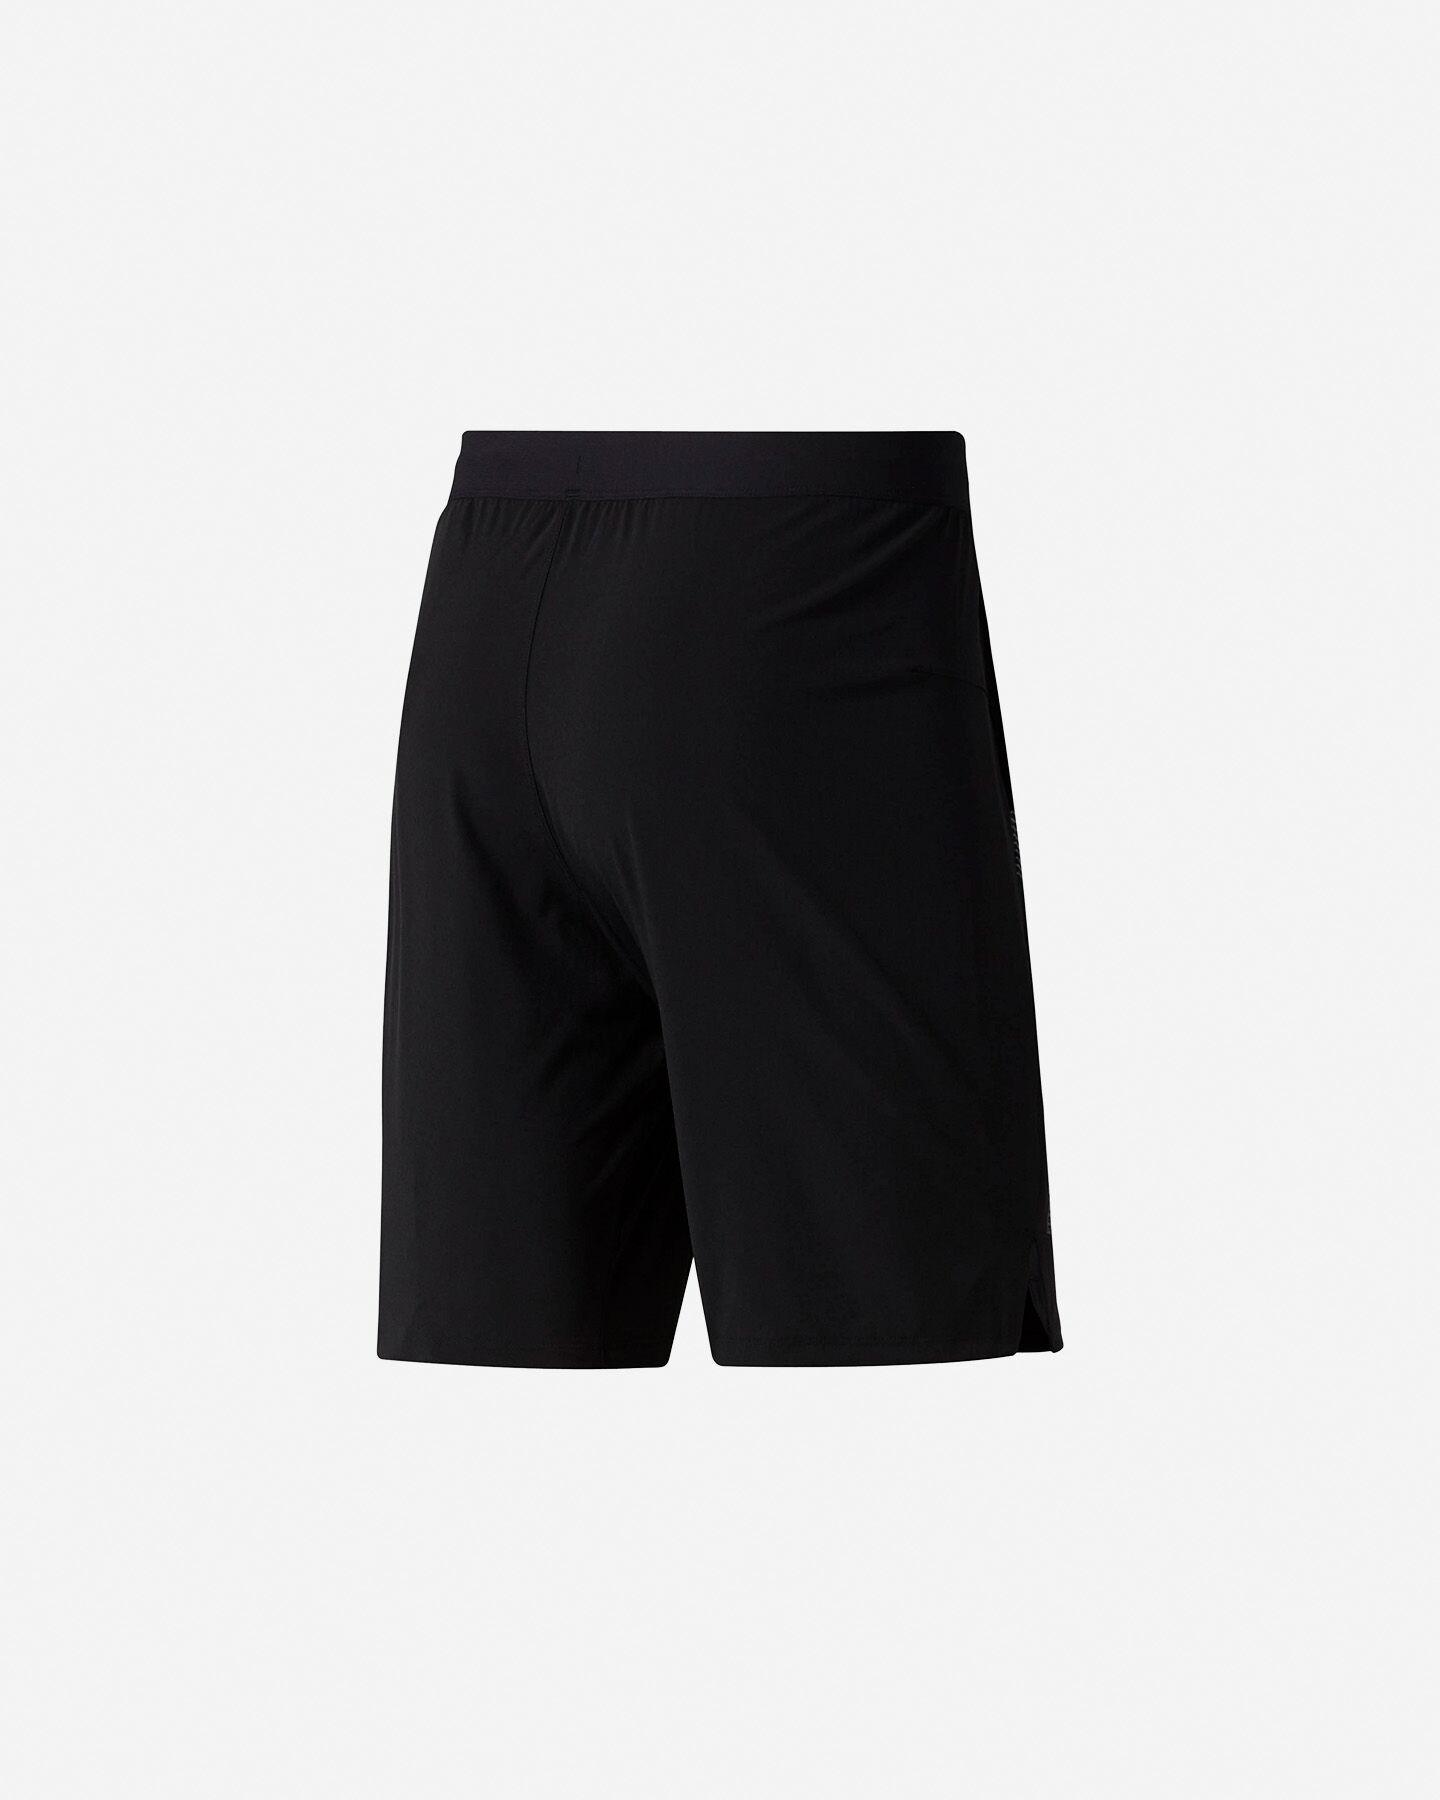 Pantalone training REEBOK SPEEDWICK SPEED M S5081642 scatto 1